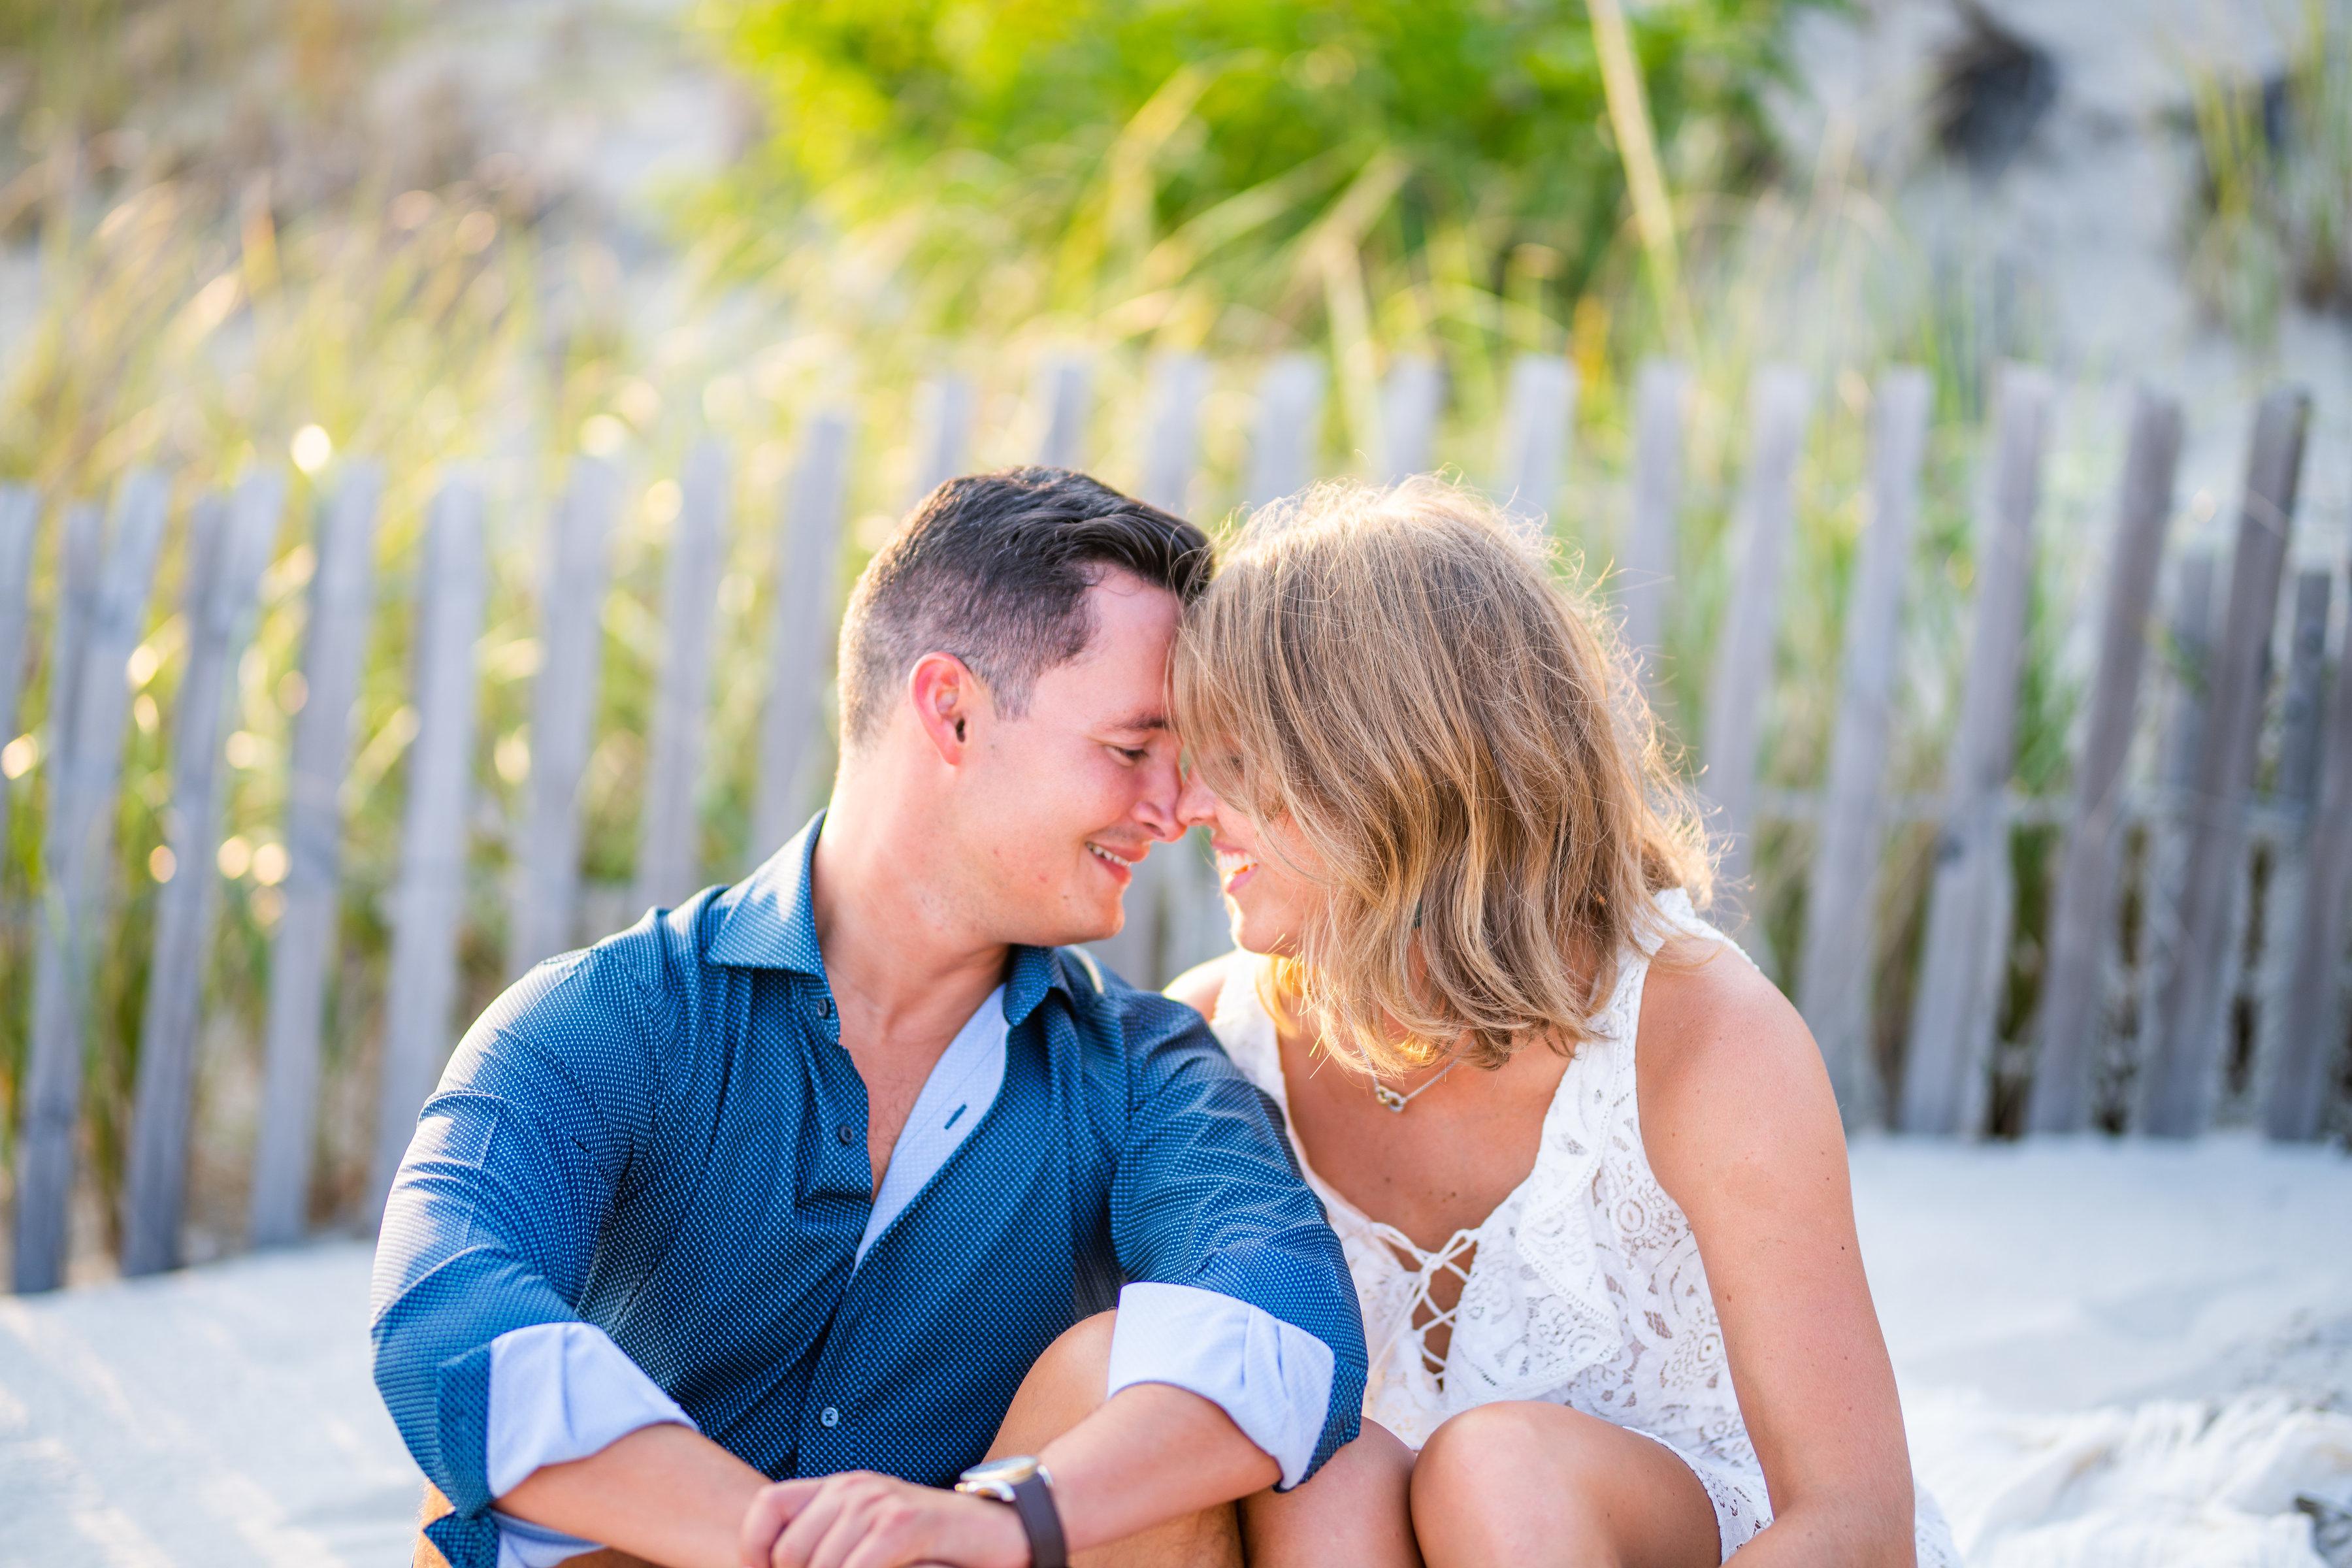 Long Beach NY Engagement Shoot | Long Beach Boardwalk Engagement Shoot | Long Island Wedding Photographer 8